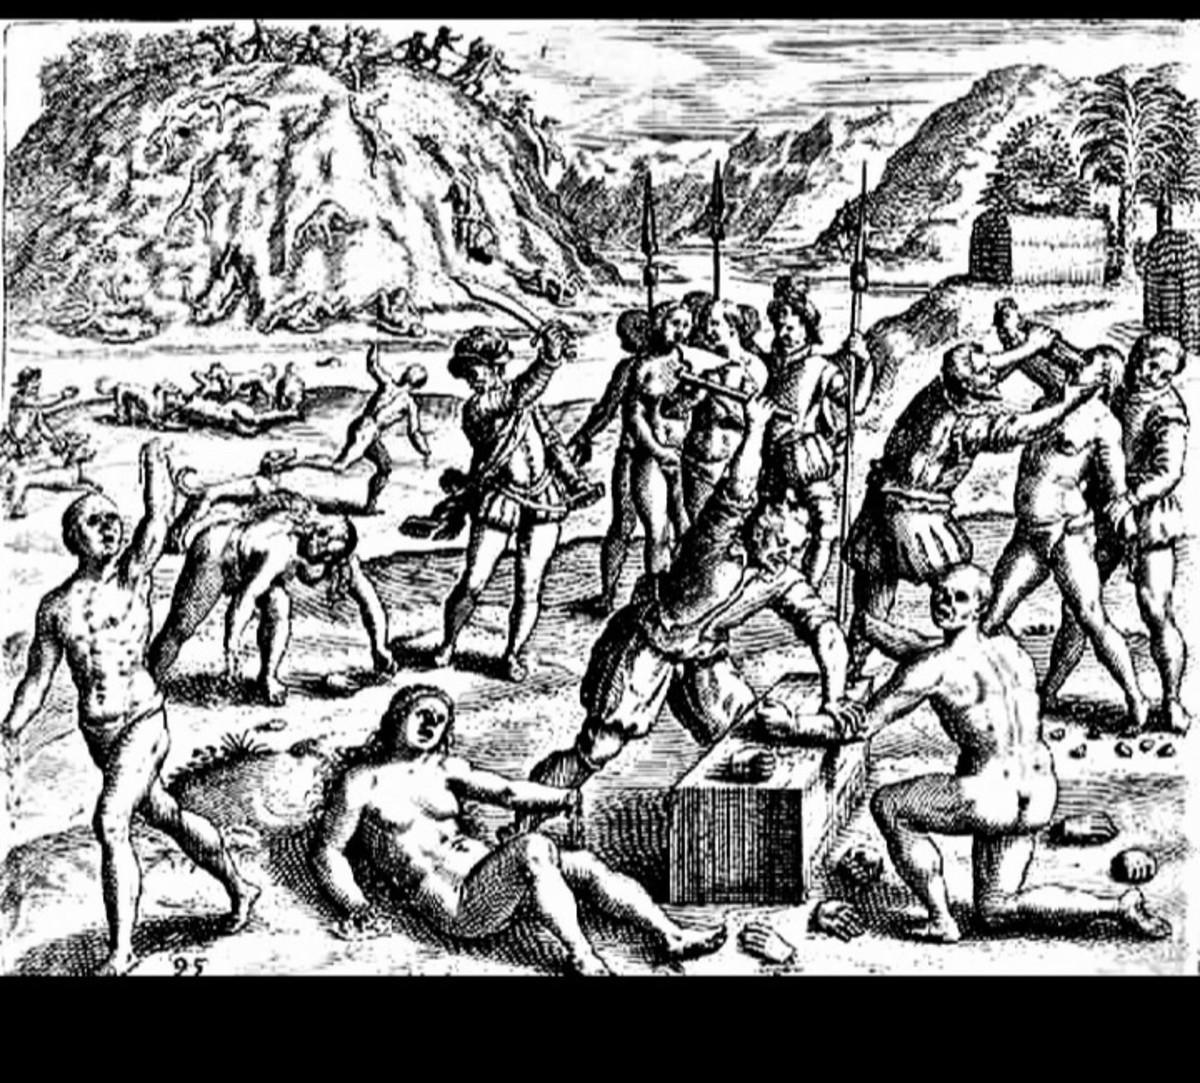 american-massacres-before-the-civil-war